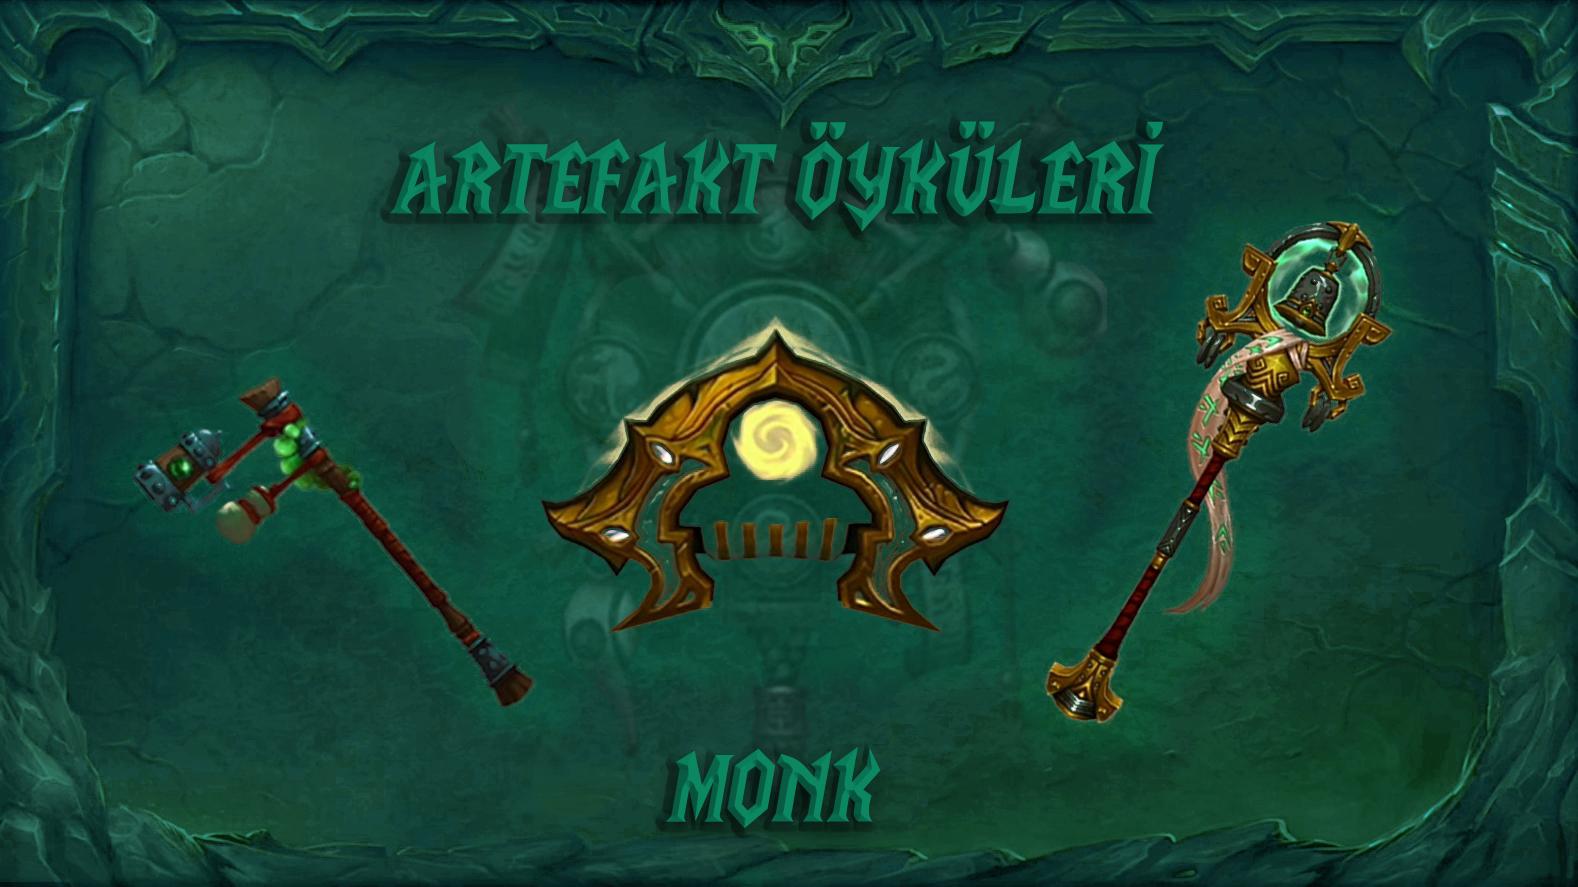 lorekeeper-artefakt-oykuleri-monk